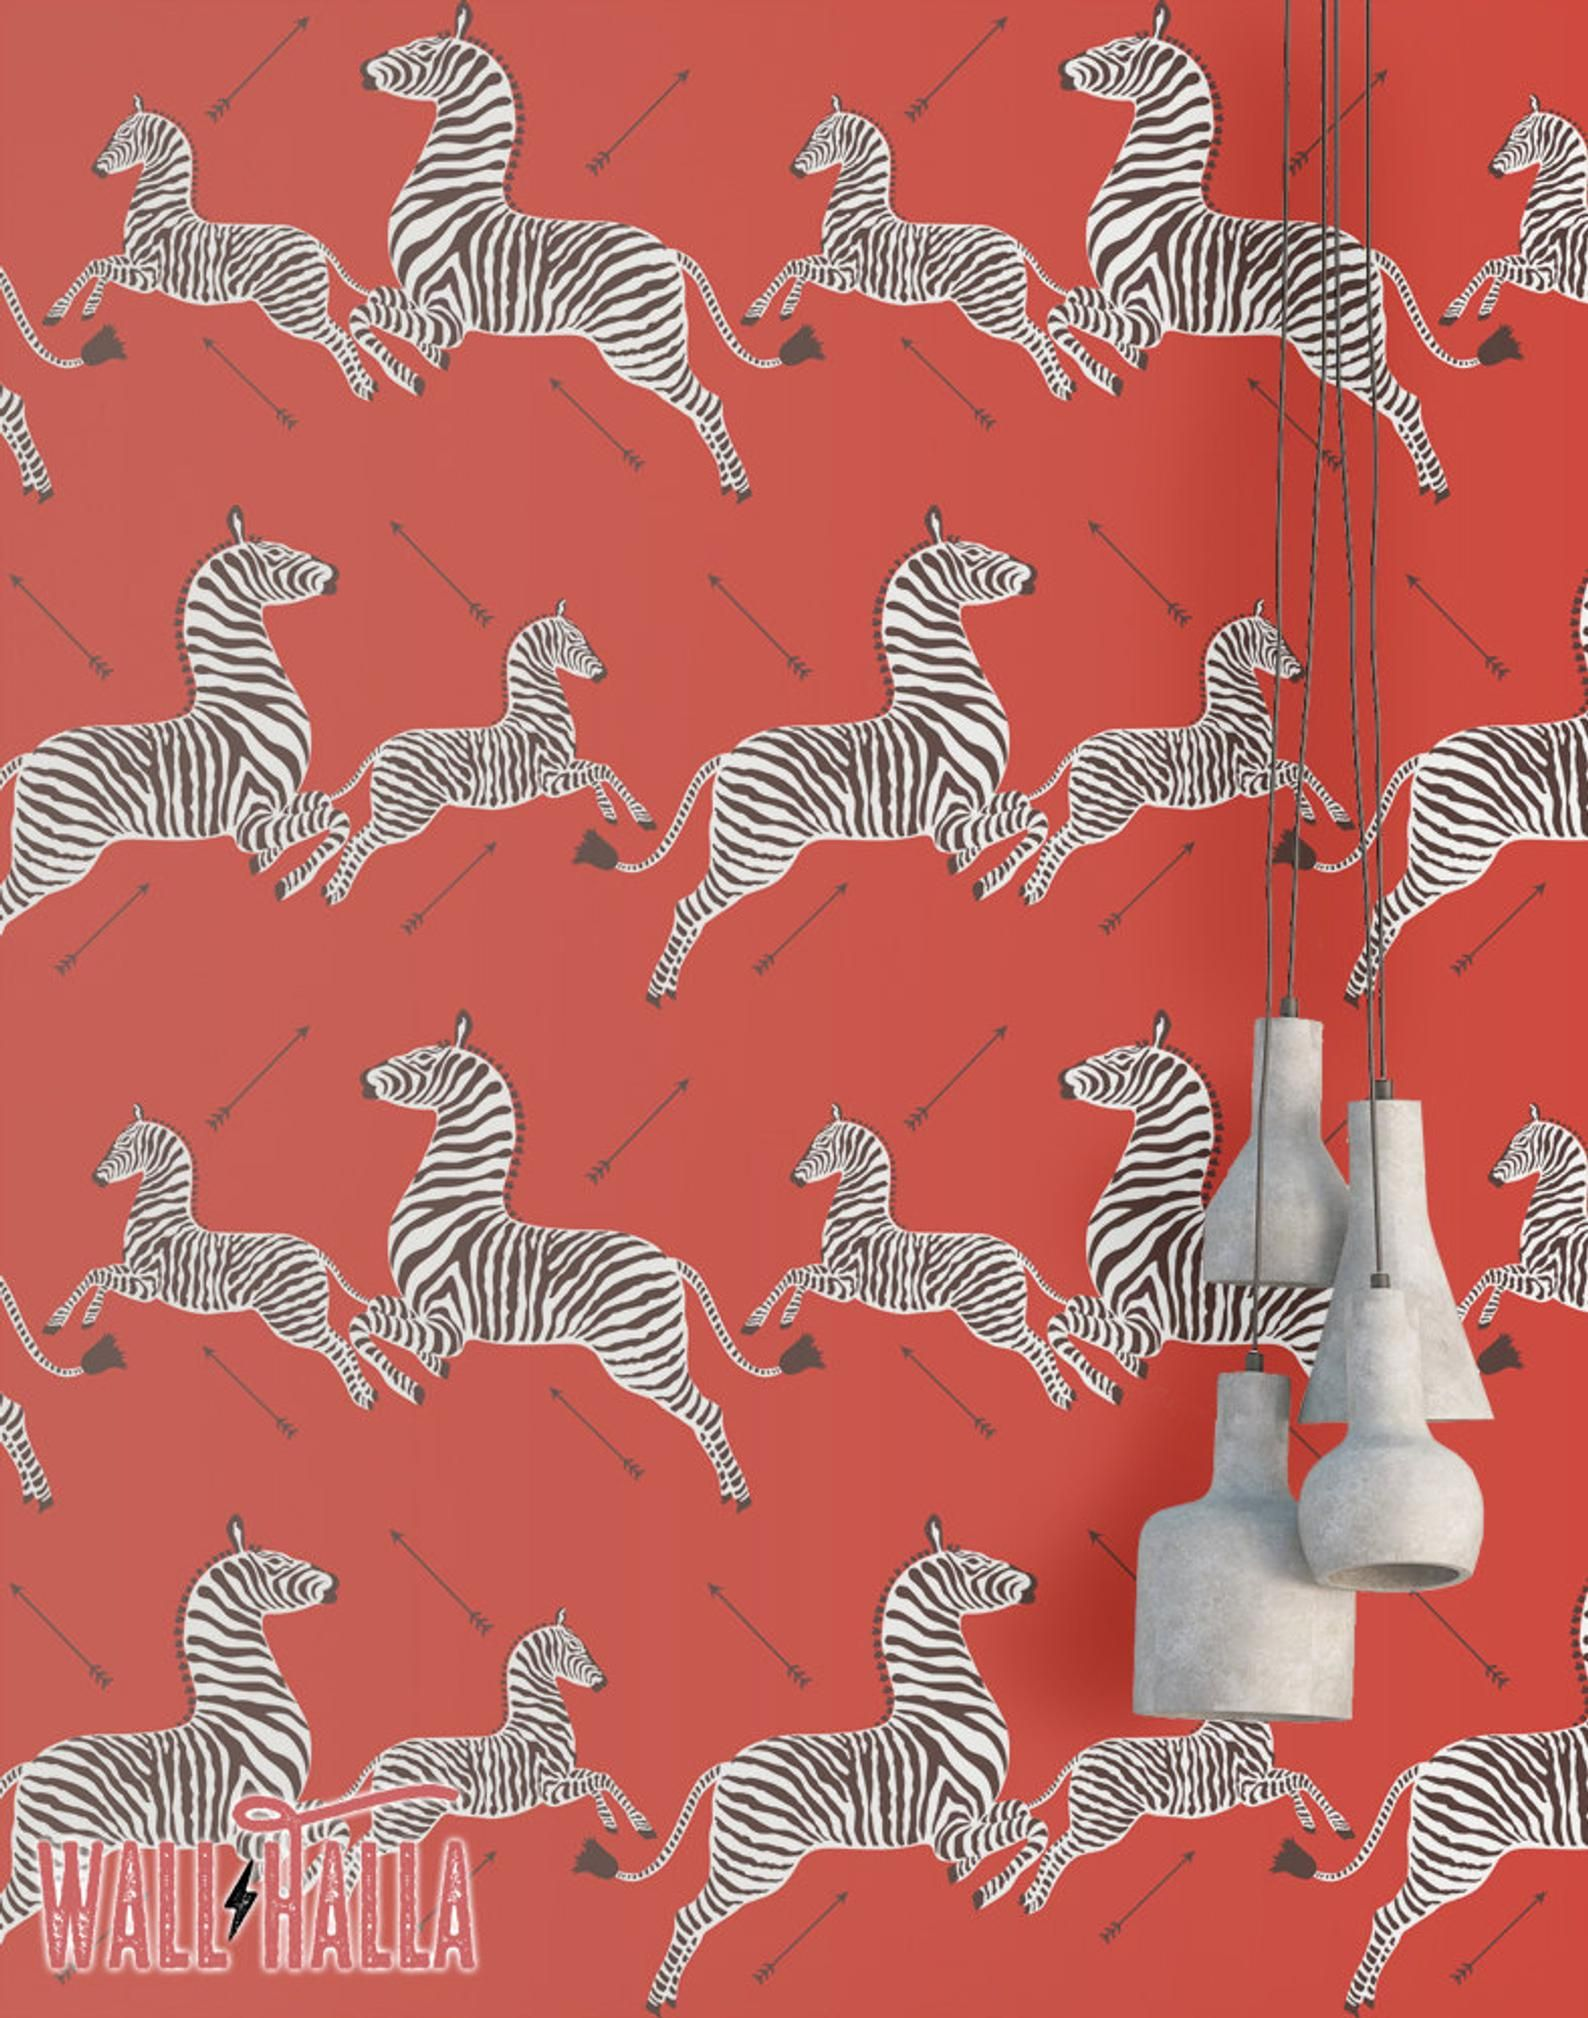 Red Zebra Wallpaper Peel And Stick Self Adhesive Wallpaper Etsy Fondo De Pantalla De Cebra Ideas De Fondos De Pantalla Papel Tapiz Autoadhesivo